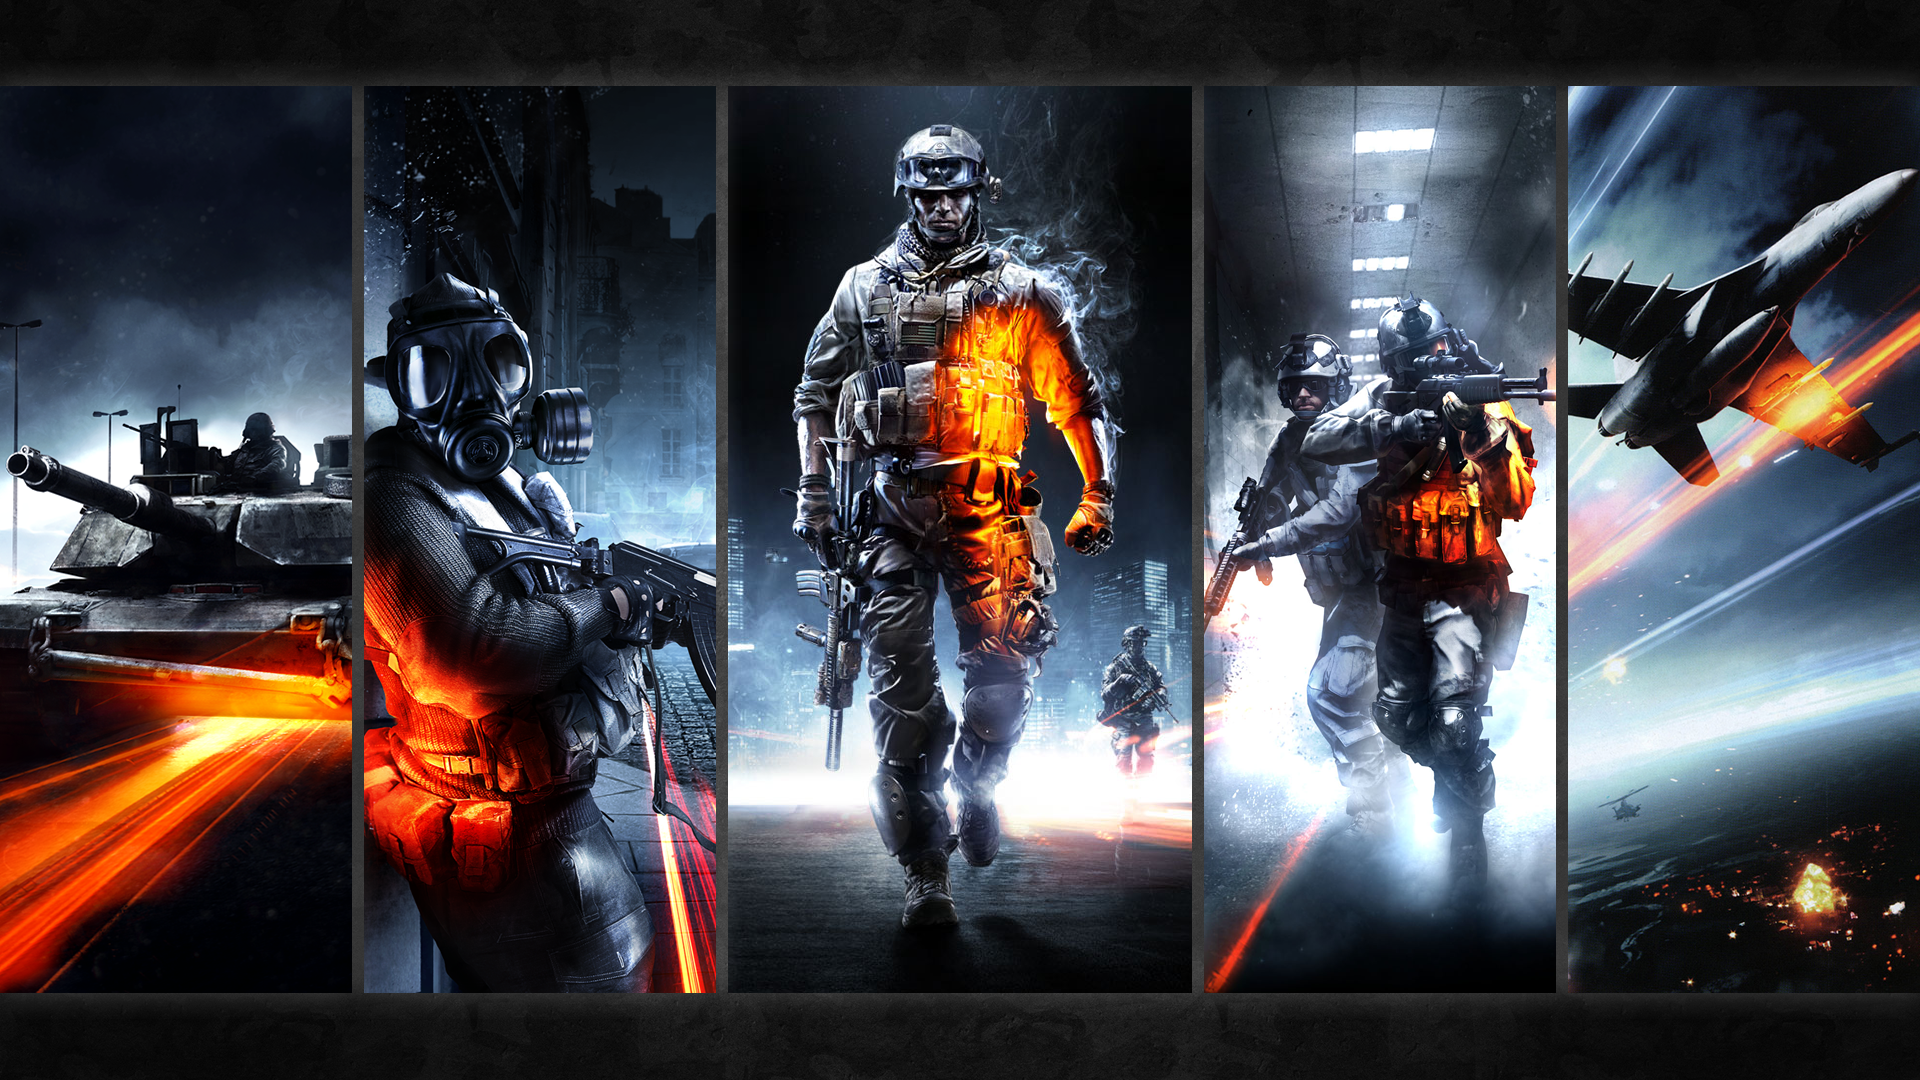 Battlefield 4 wallpapers pictures images - Battlefield screensaver ...